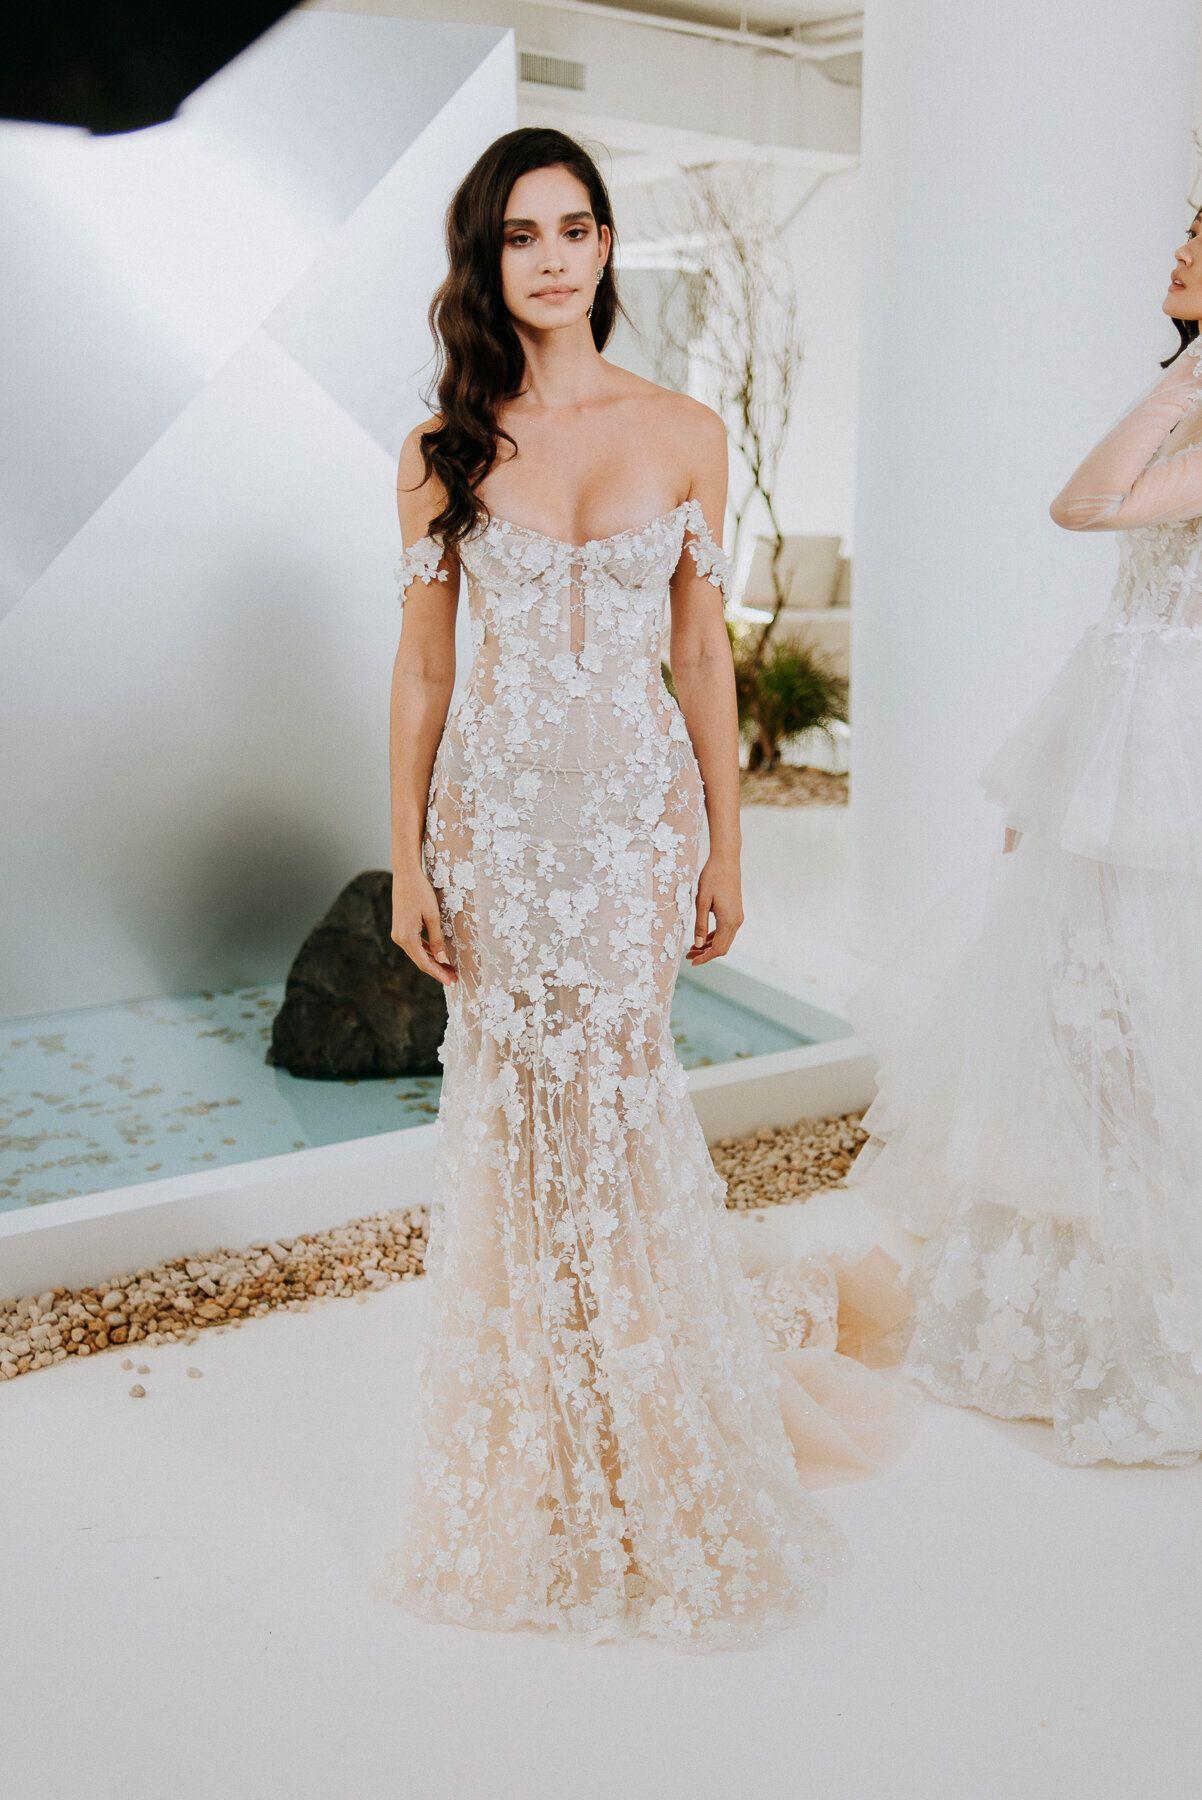 Galia Lahav Couture Gala Fall 2020 Collection Preview Little White Dress Bridal Shop Denver Colorado S Best Designer Wedding Dresses And Accessories Bridal Gowns Mermaid Wedding Dress Accessories White Bridal Dresses